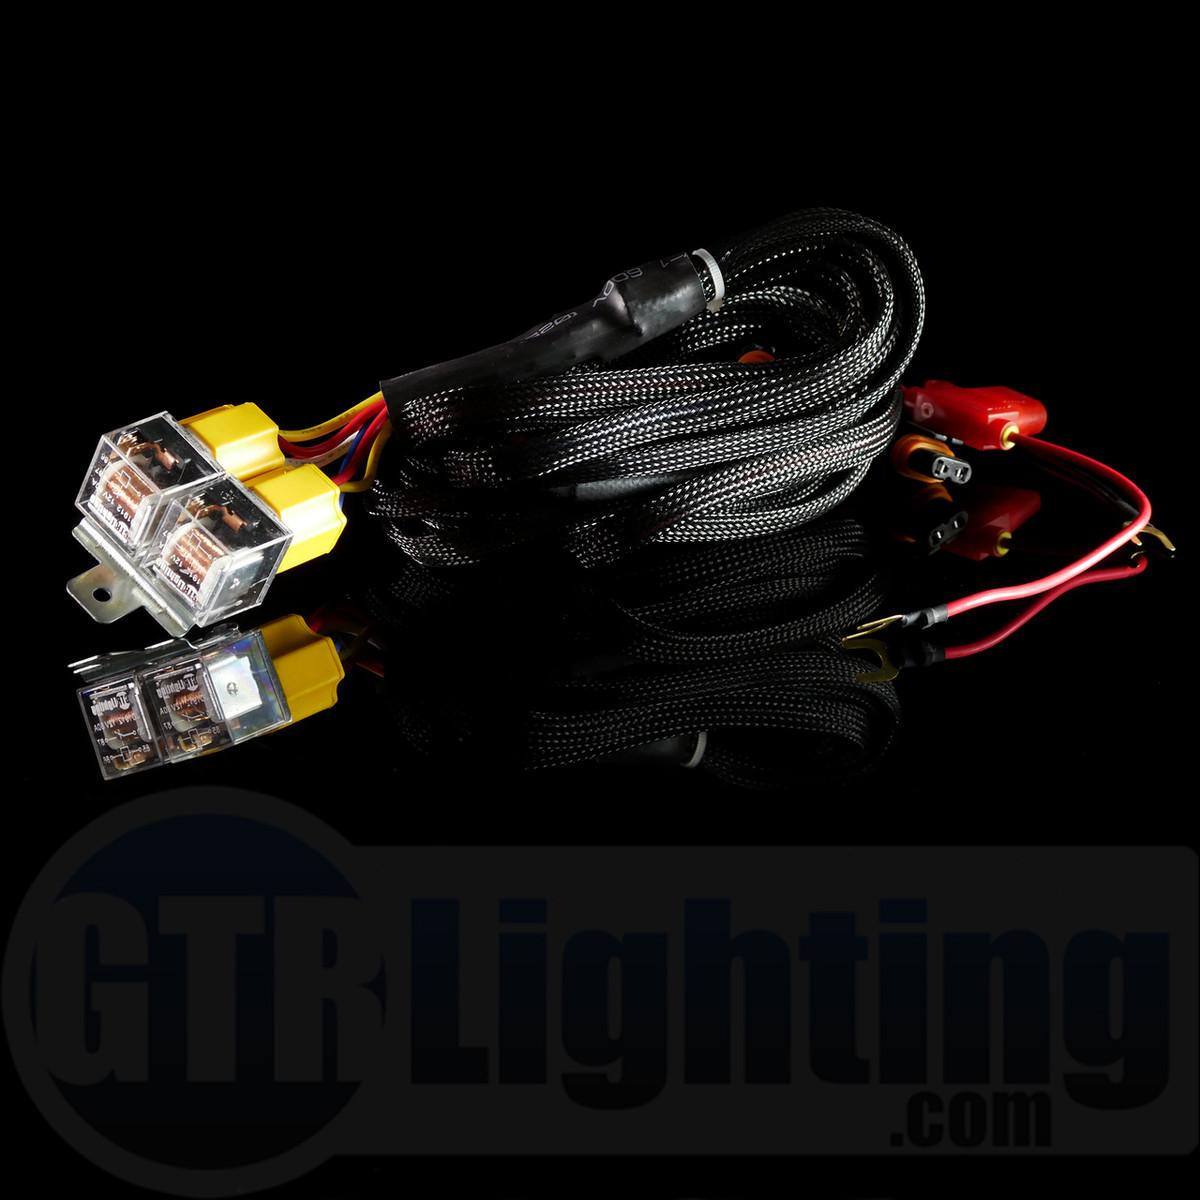 Gtr Lighting Single Beam Hid Relay Harness Wire